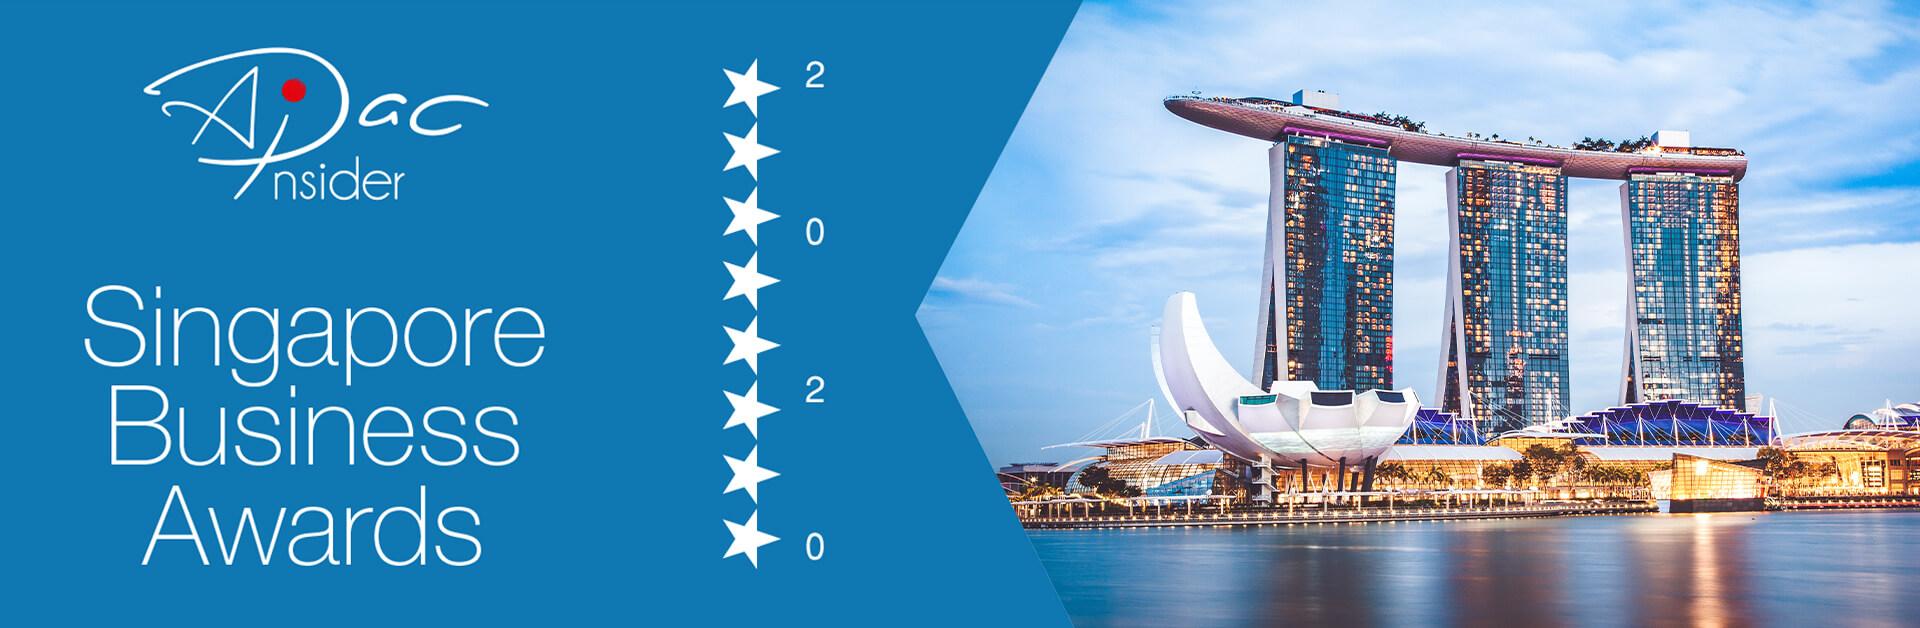 Singapore business awards